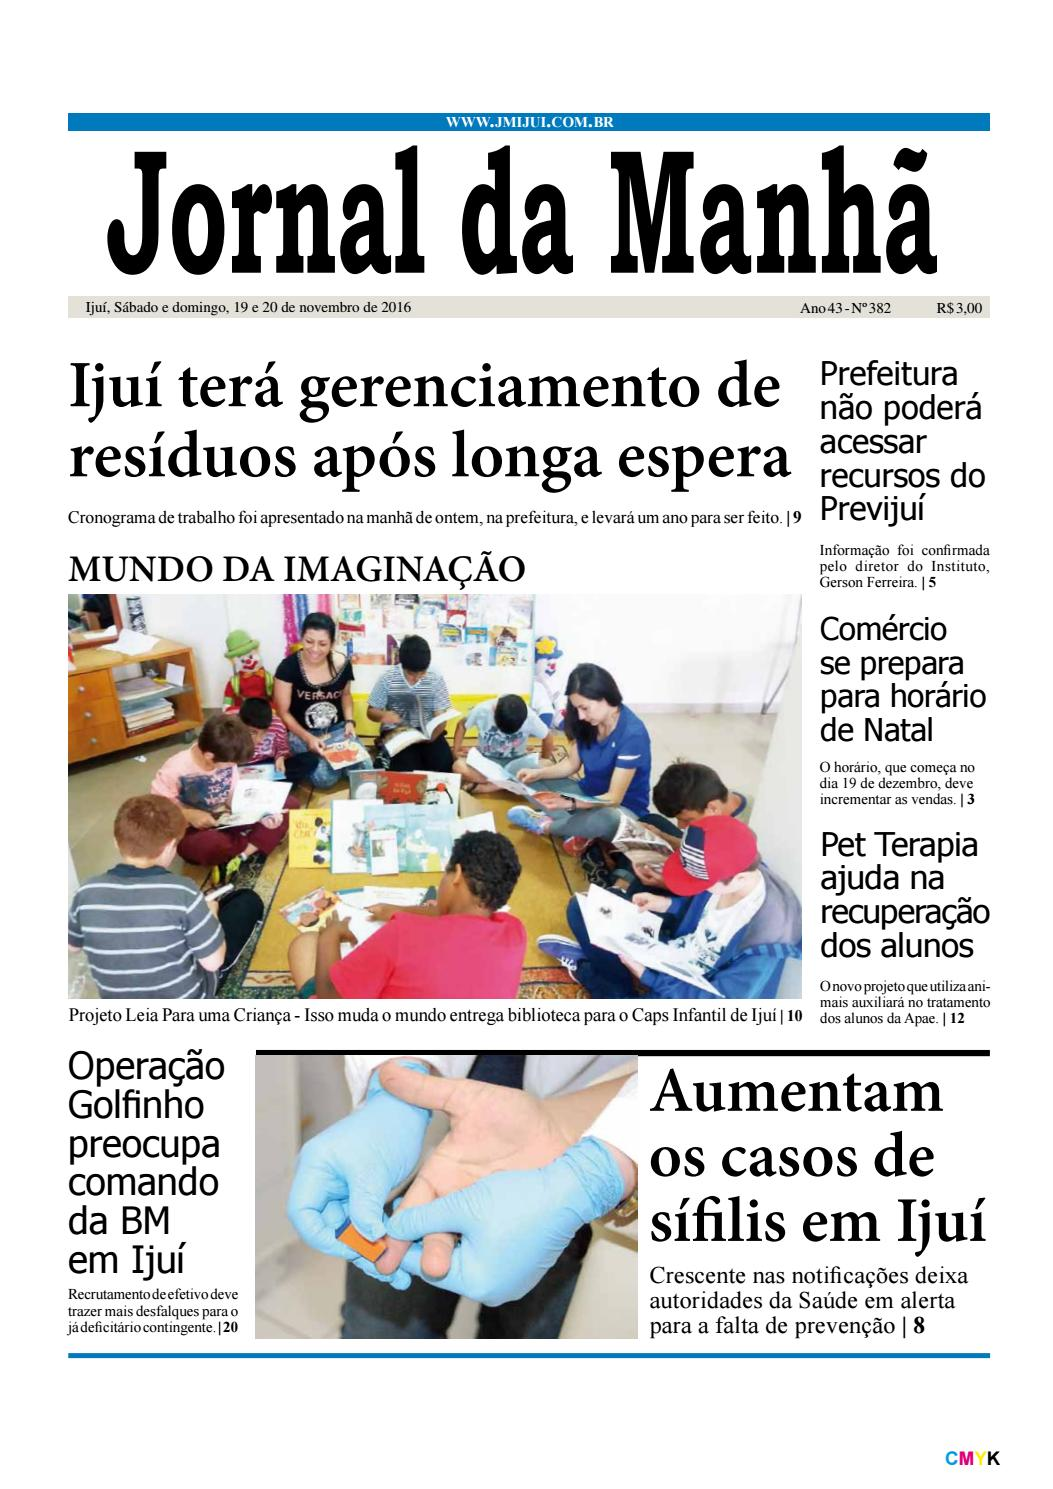 Sitepaginas19 by Jornal da Manhã Ijuí - issuu 48bcafe3a0340